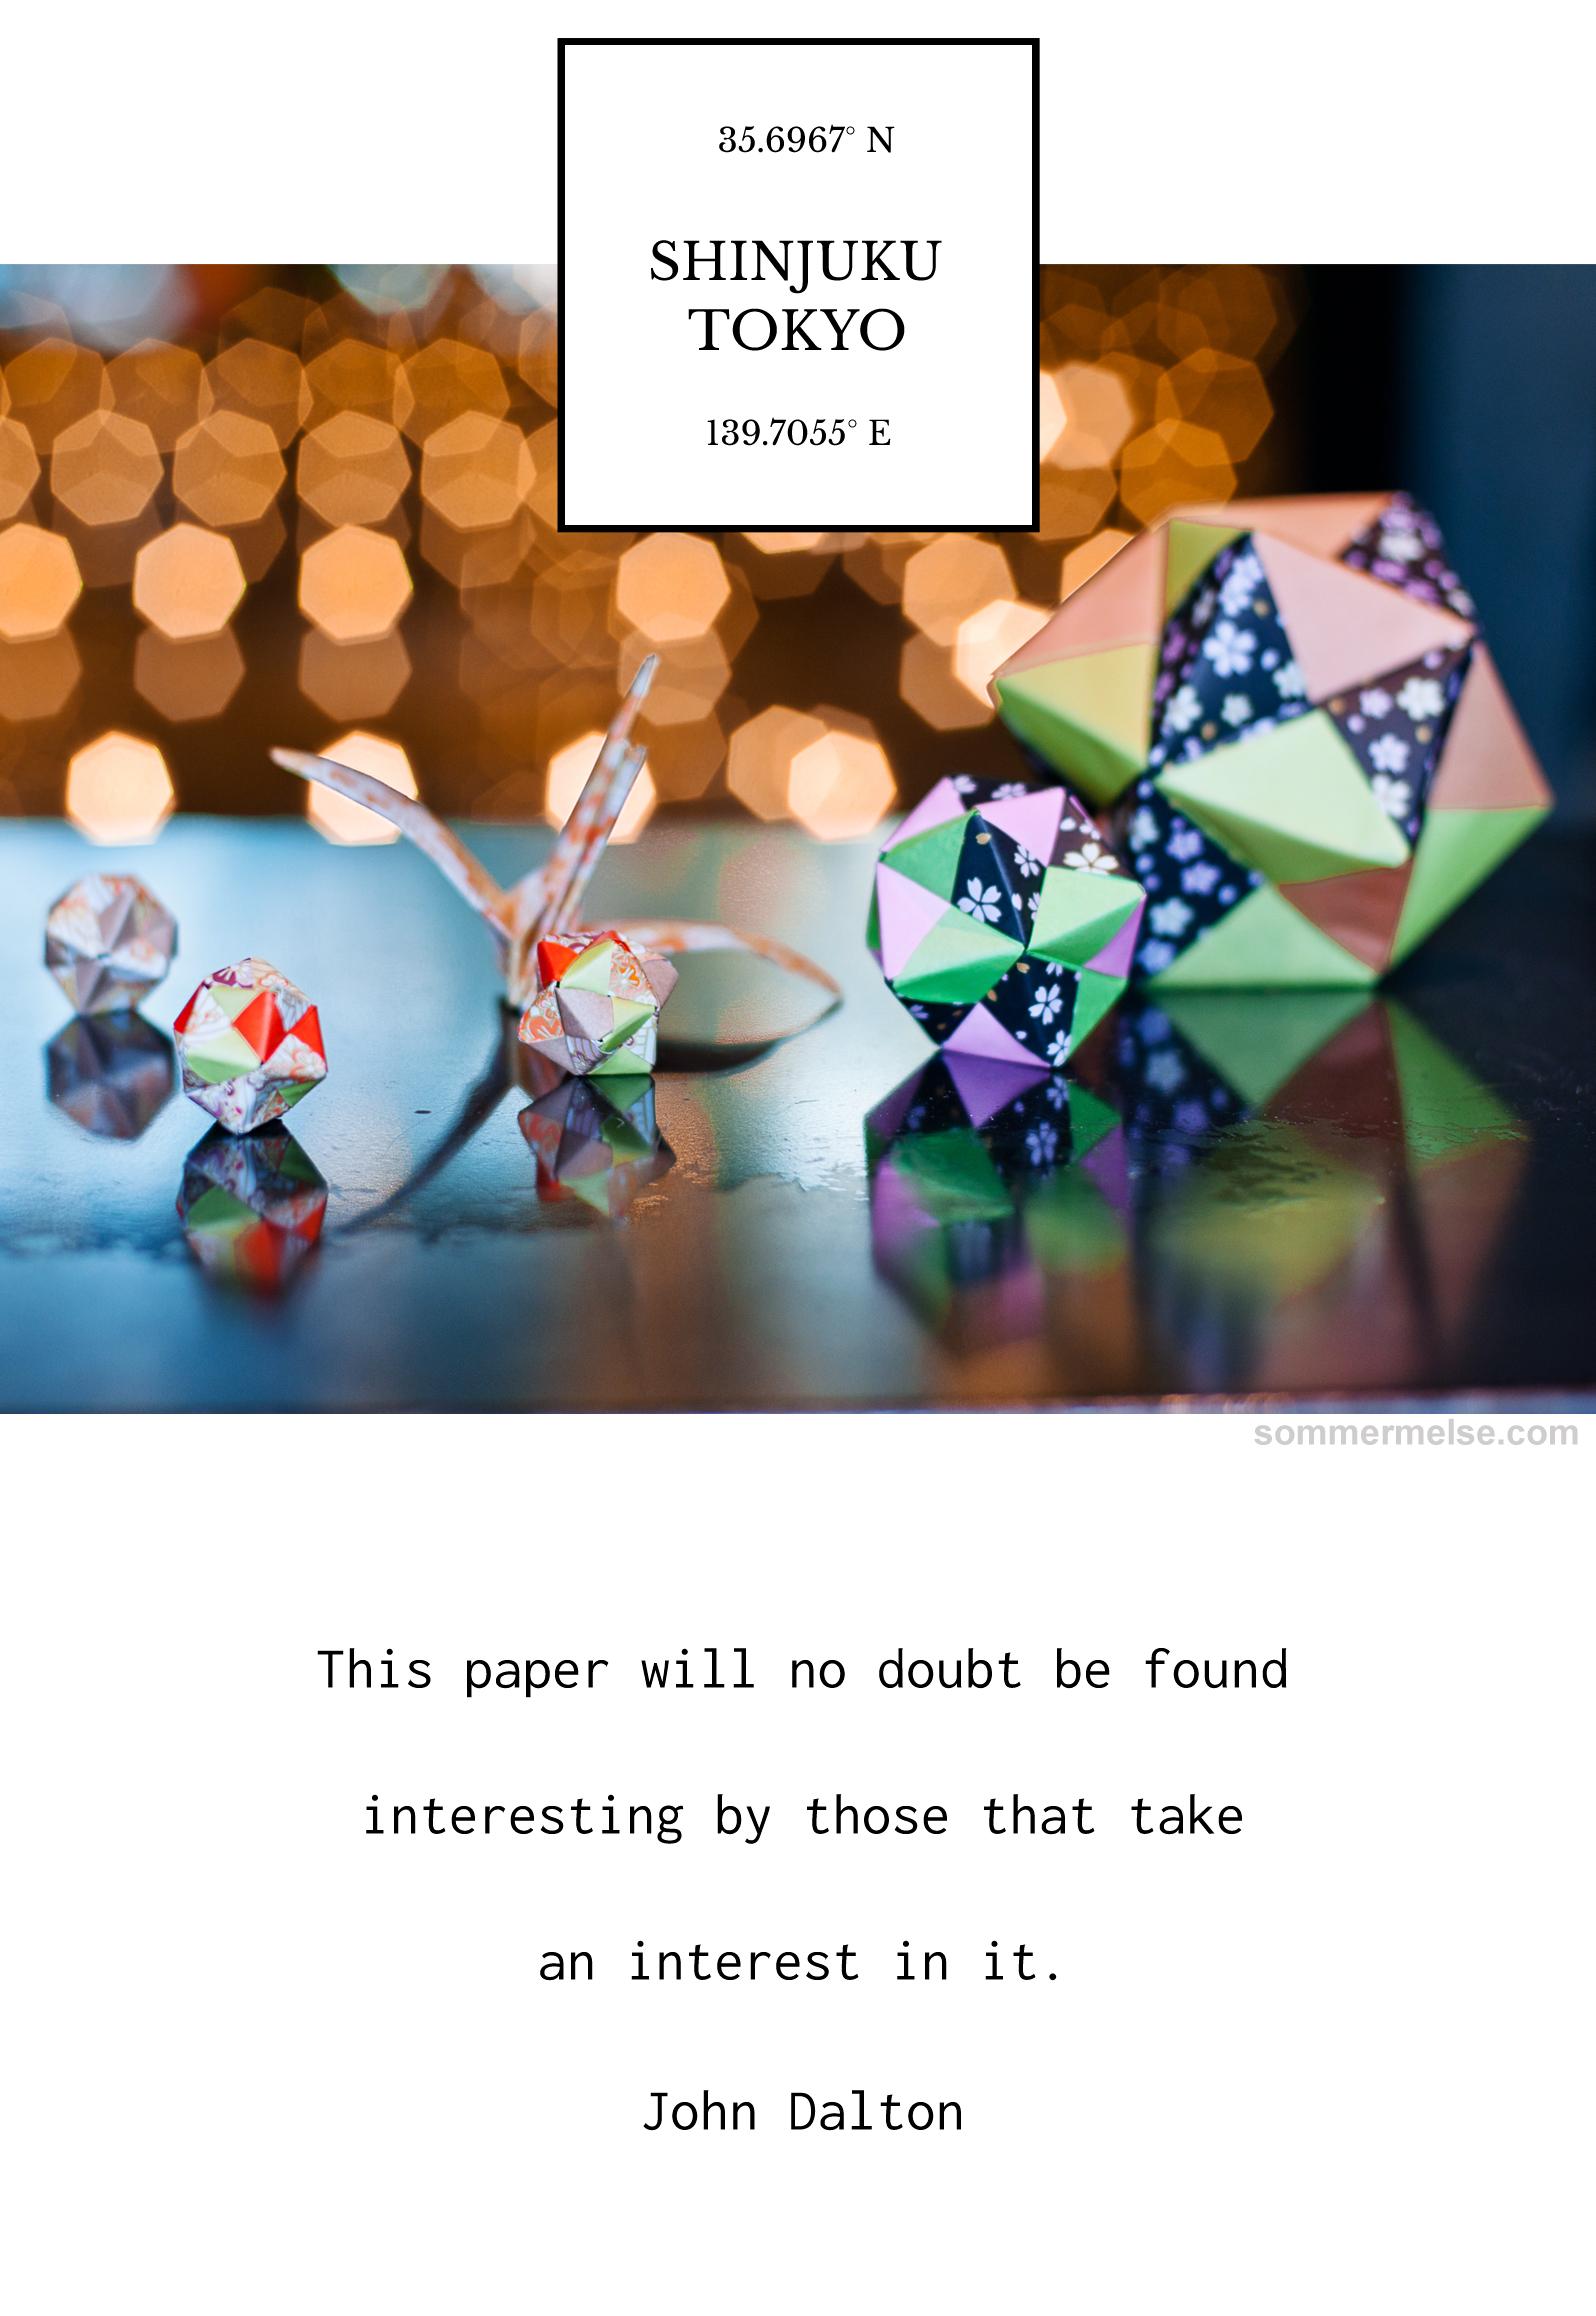 67_finding_wonder_interesting_paper_john_dalton_quote